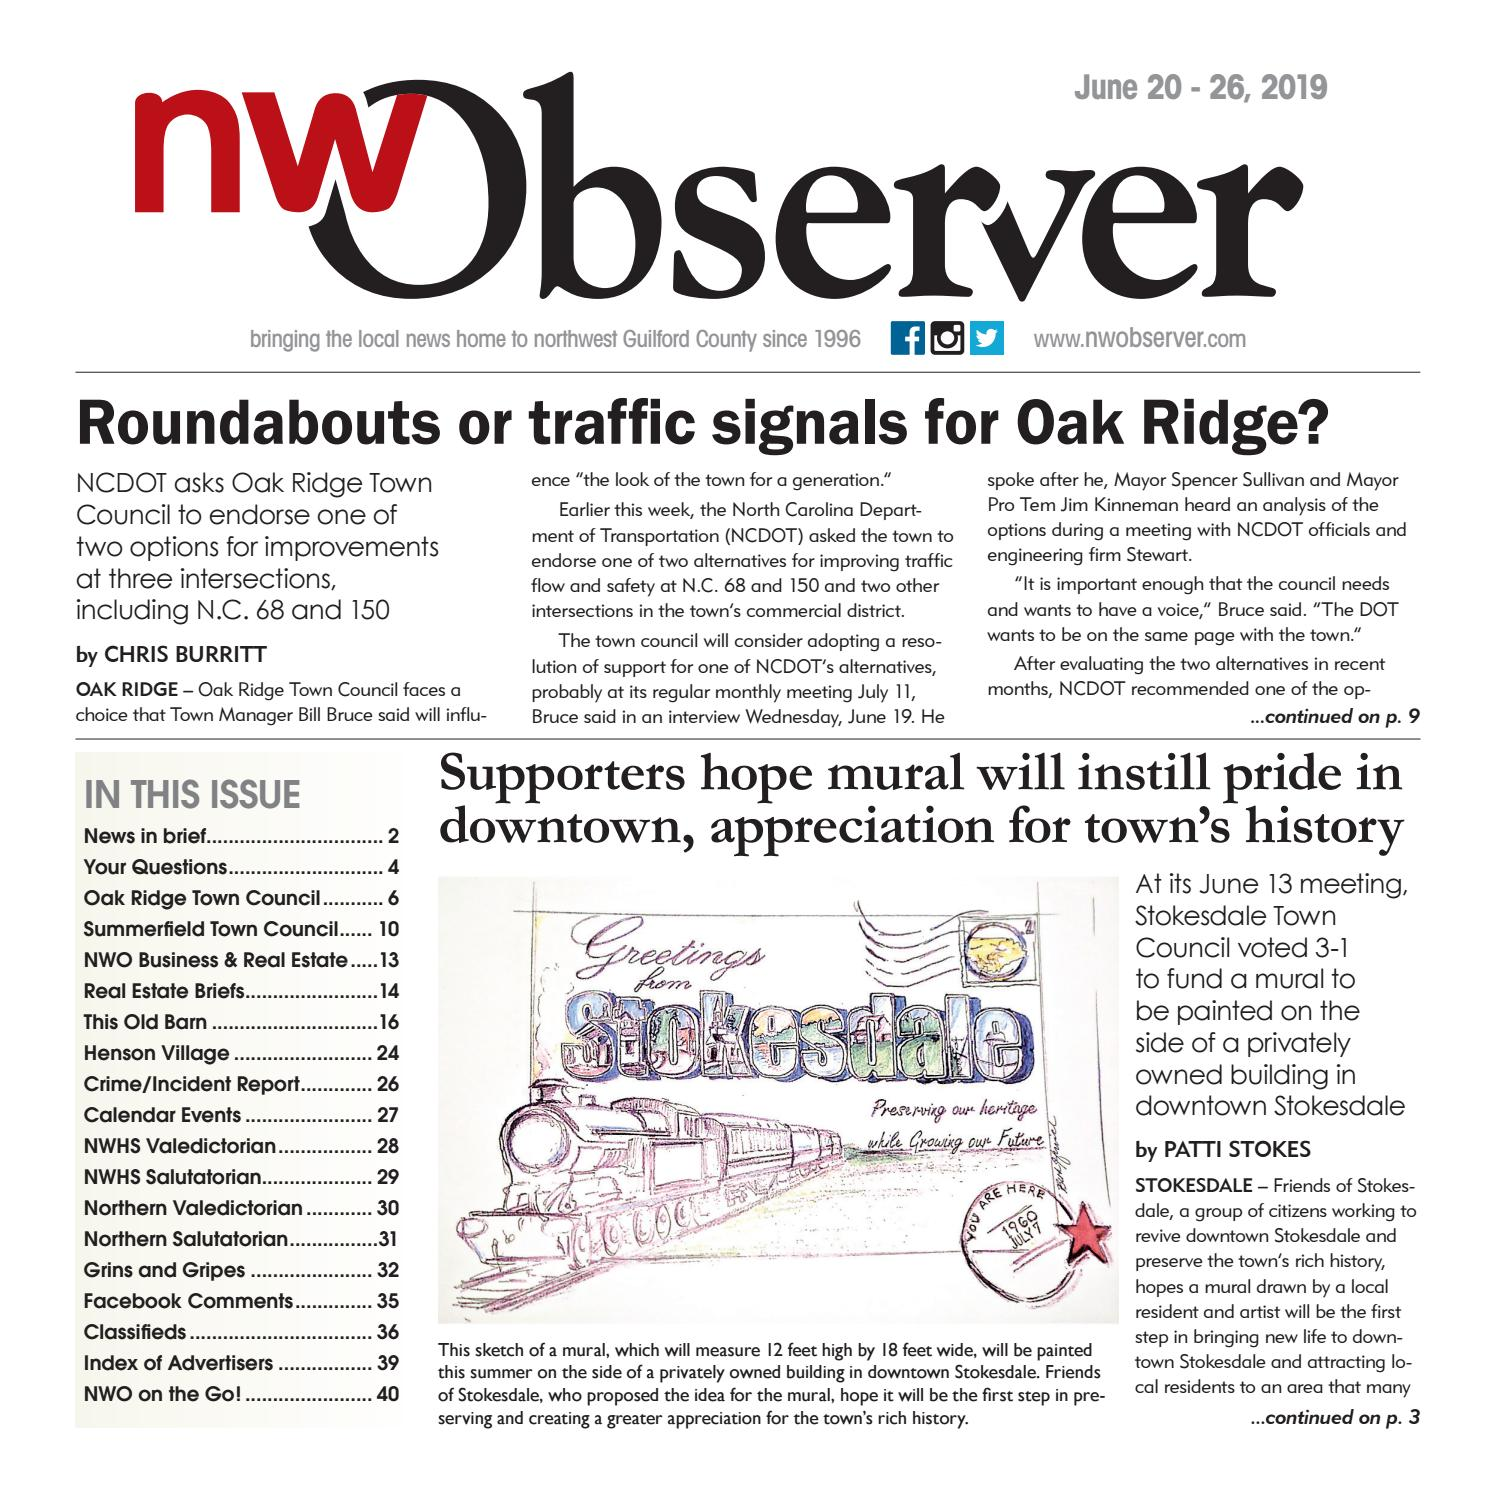 Northwest Observer l June 20-26, 2019 by pscommunications